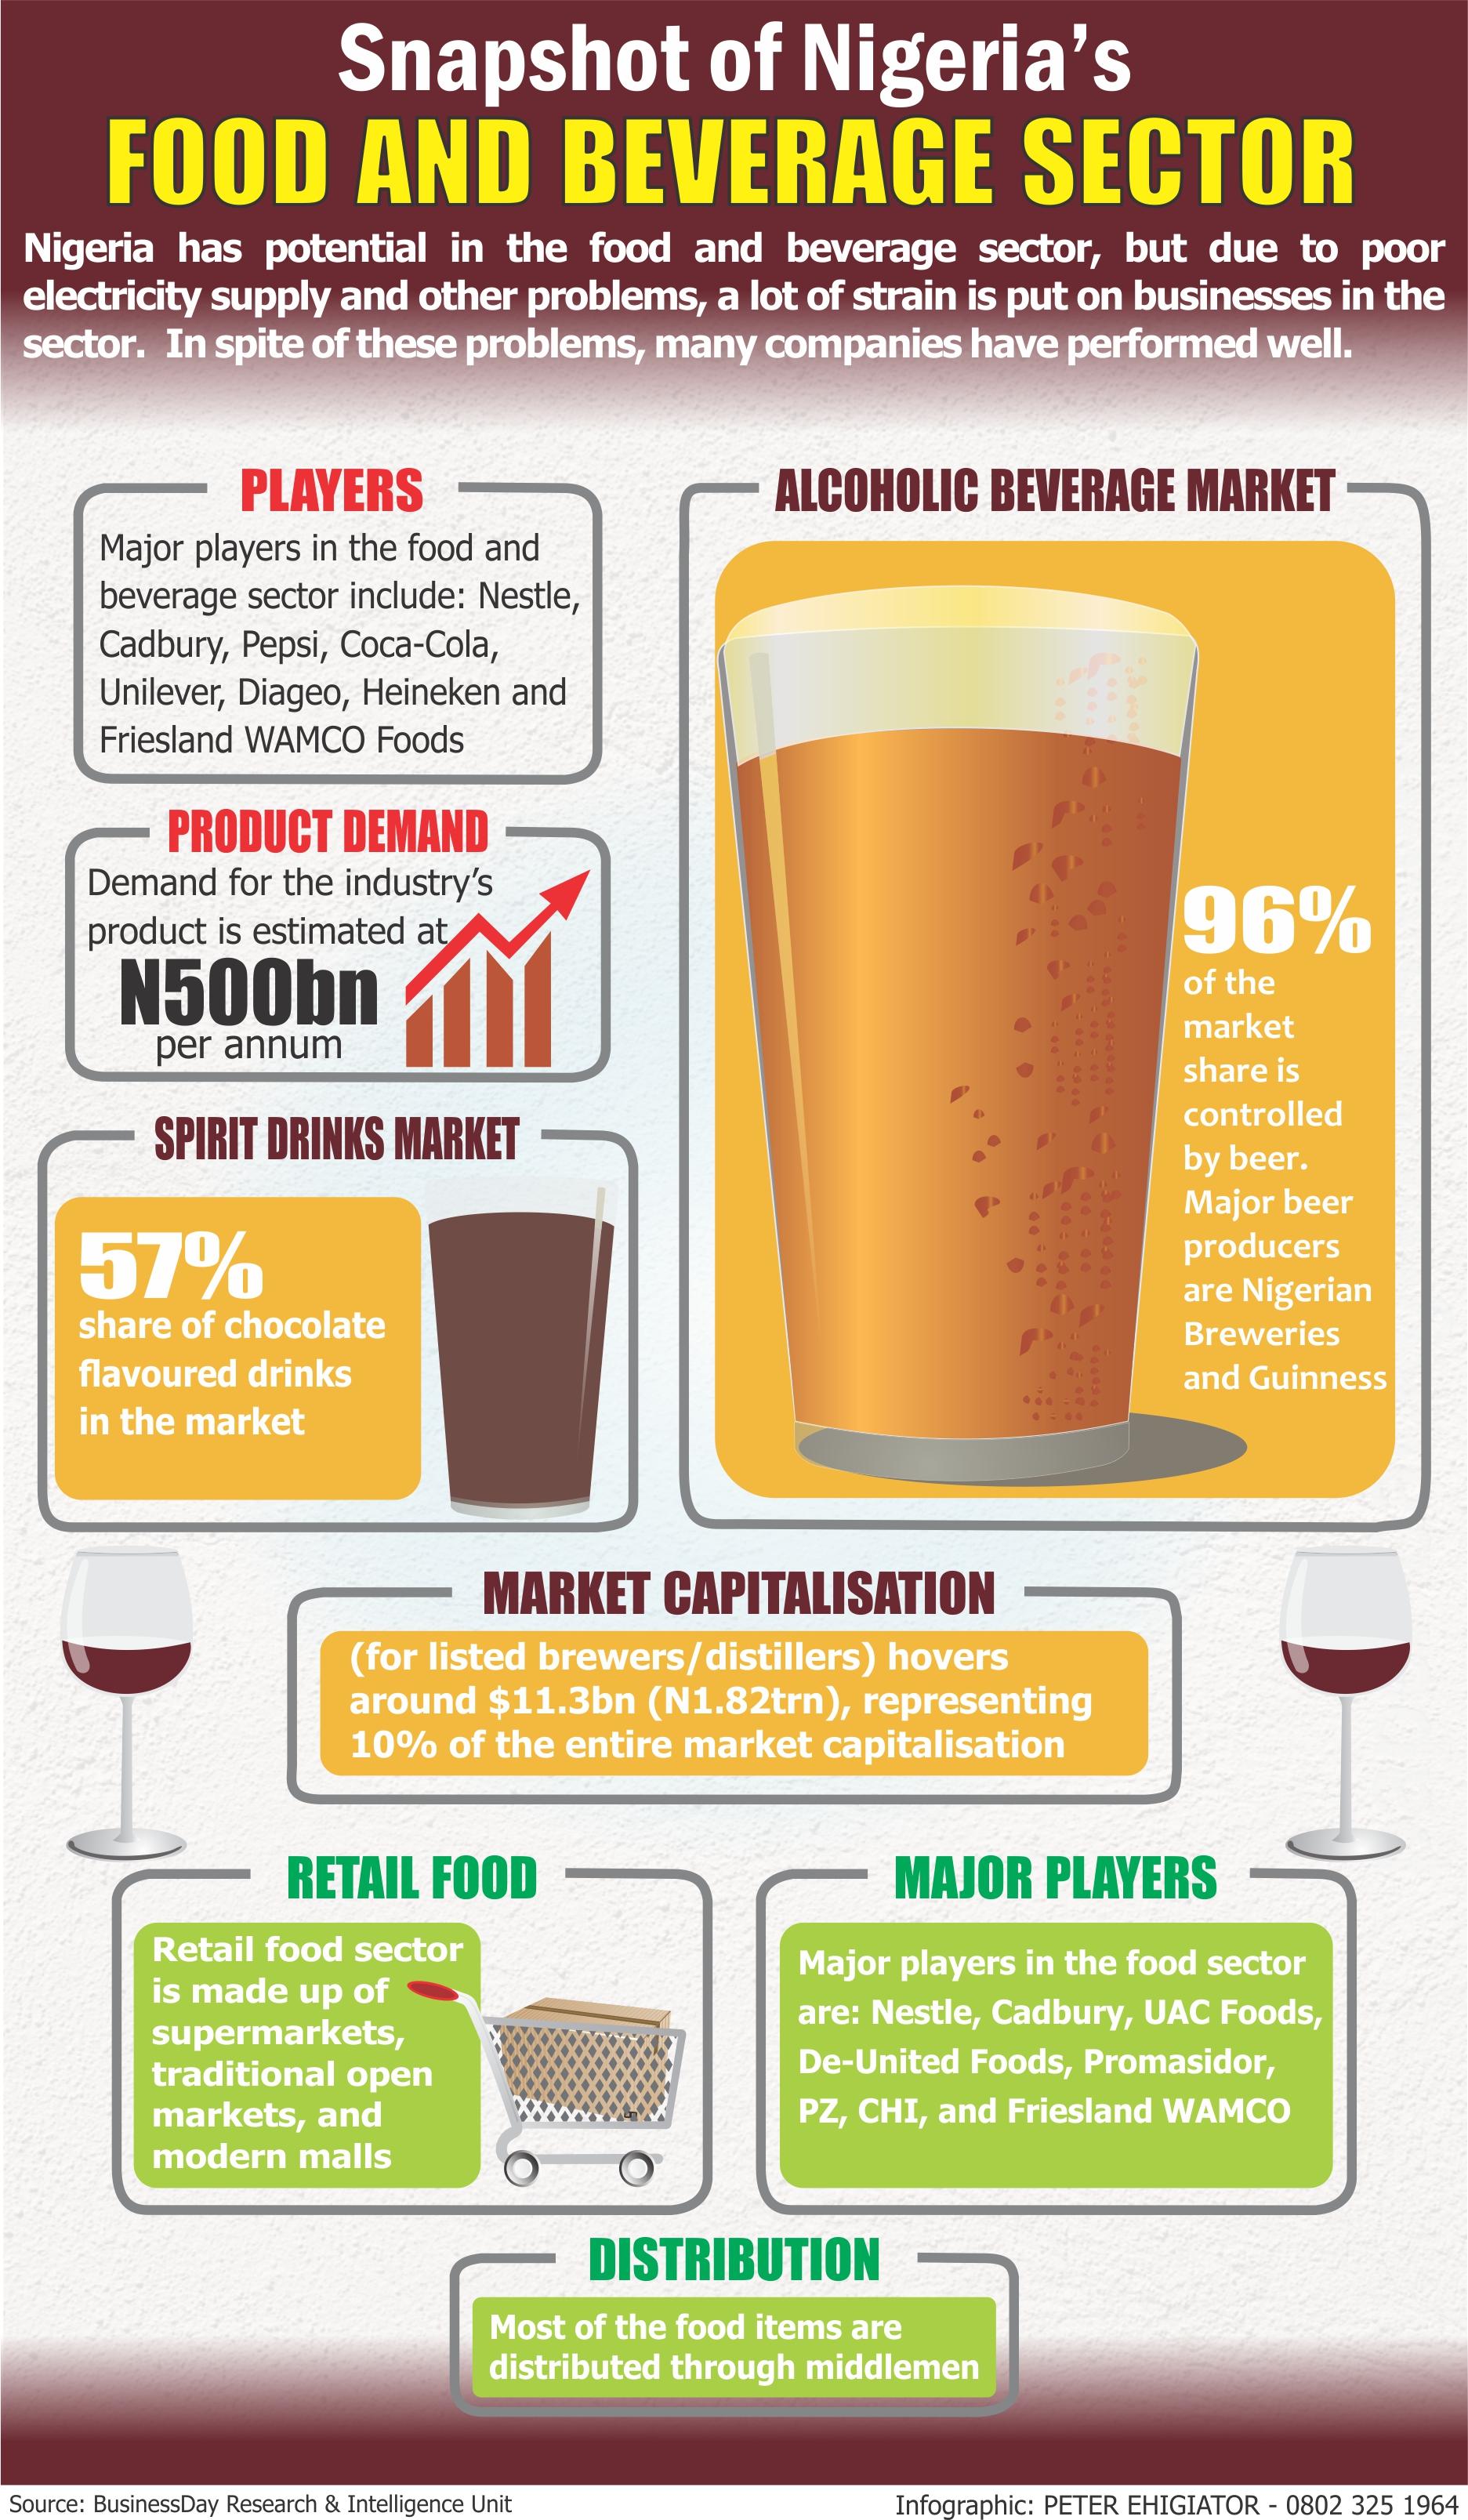 Snapshot of Nigeria Food & Beverage Sector